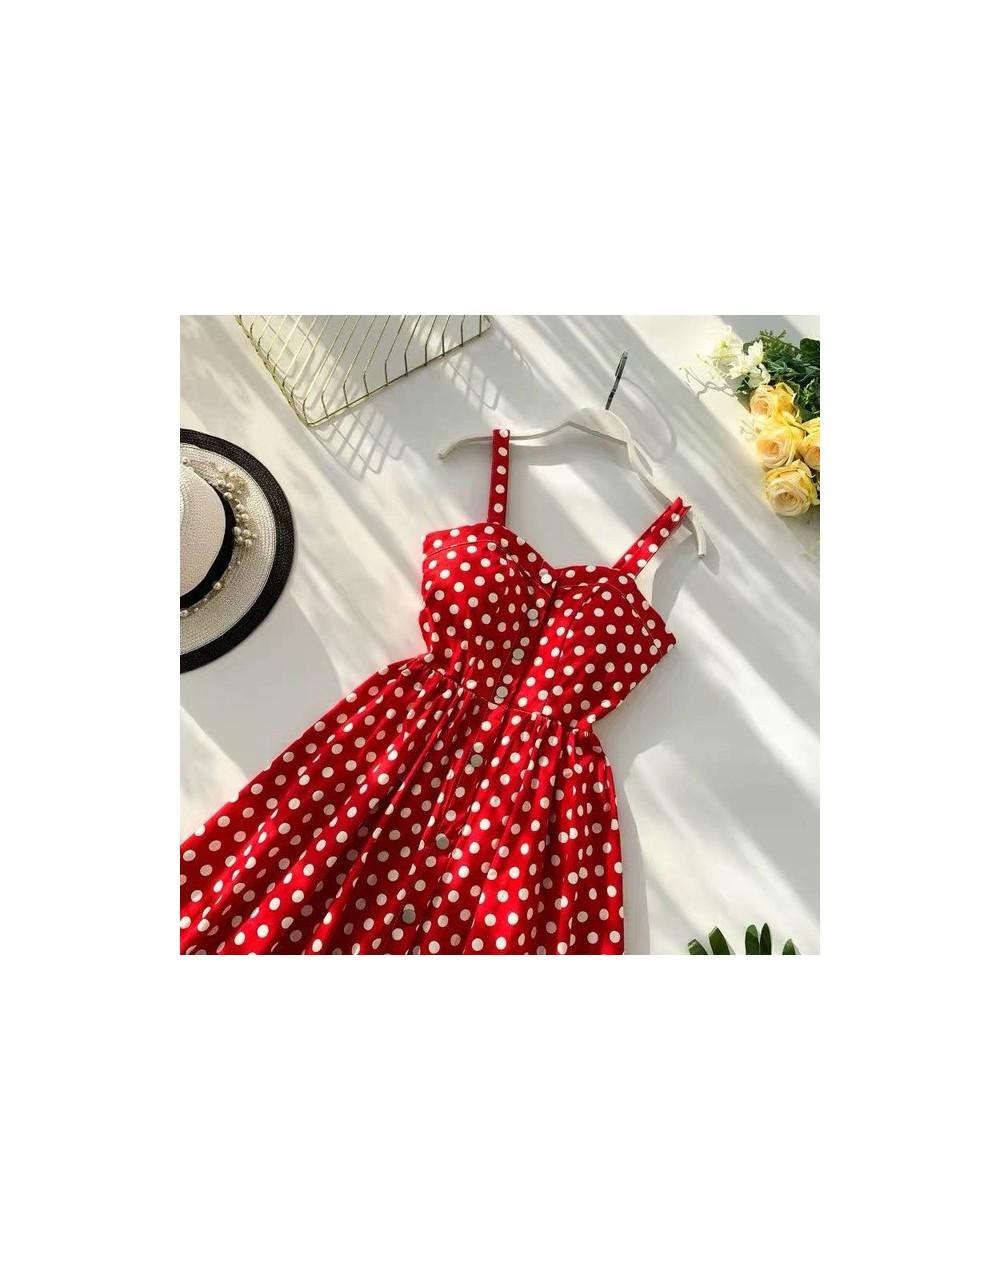 Marwin 2019 New-Coming Summer Women Spaghetti Strap Print Floral Sleeveless Empire Beach Dresses High Street Style - Red Spo...